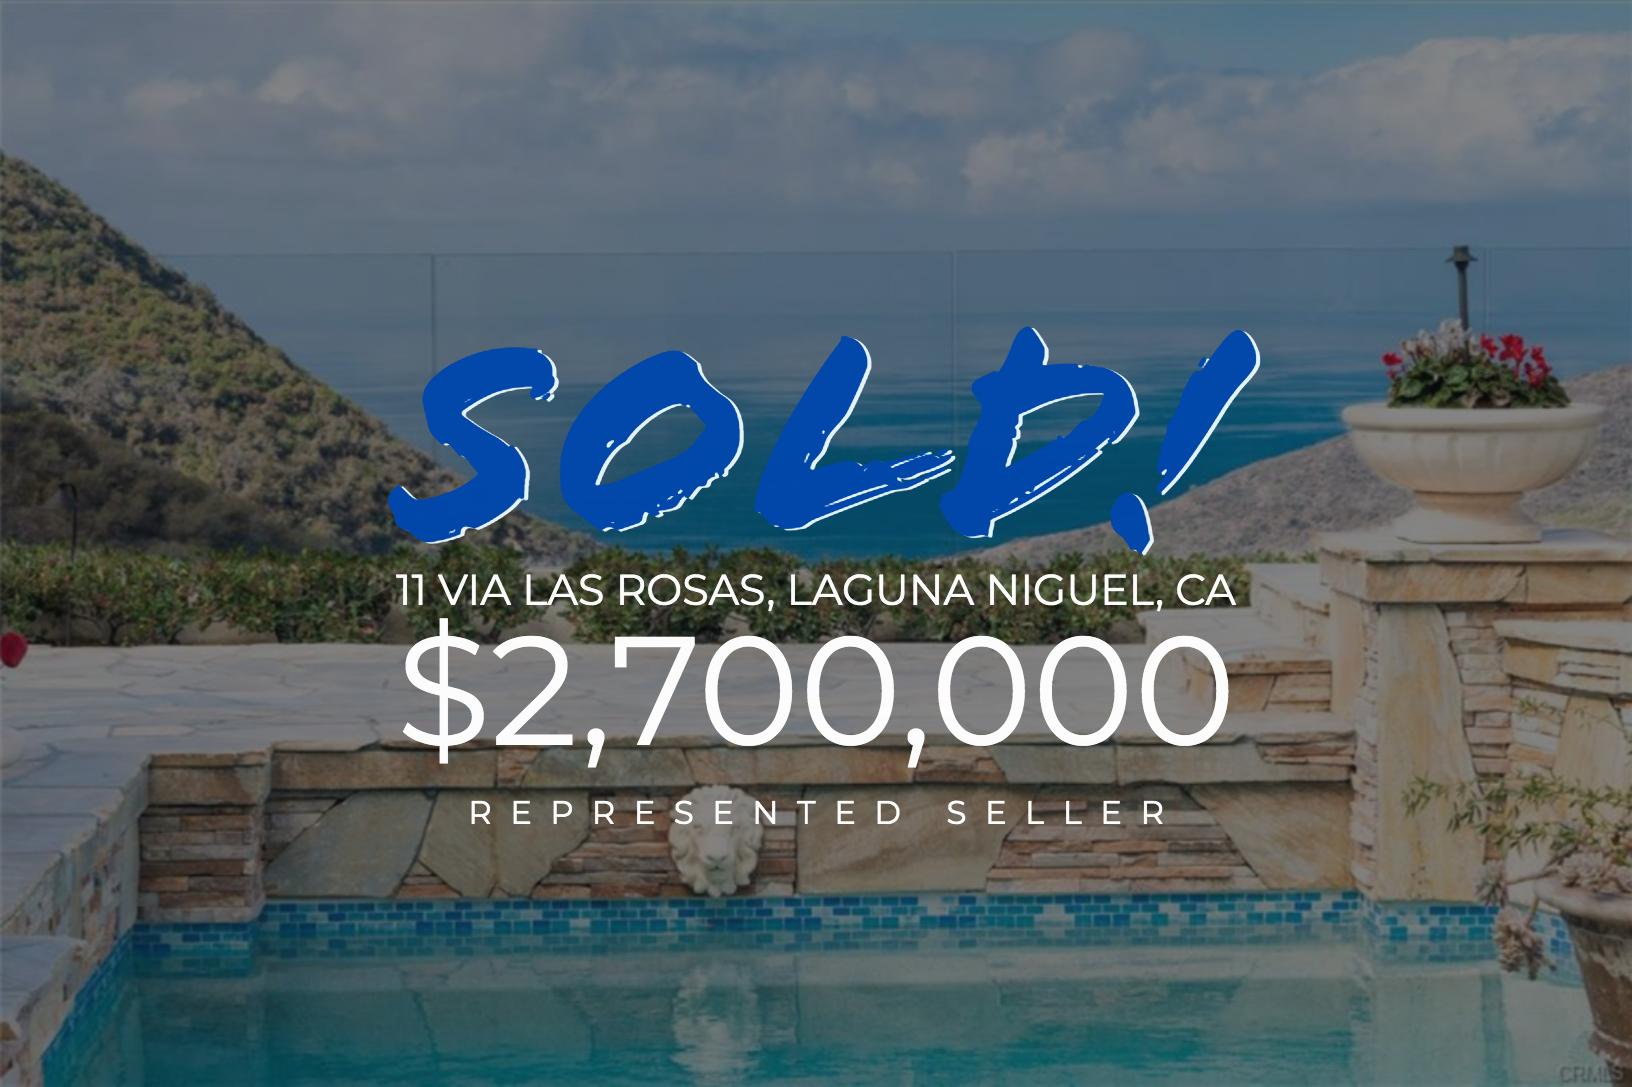 Sold With Matt Blashaw 11 Via Las Rosas in Laguna Niguel, CA